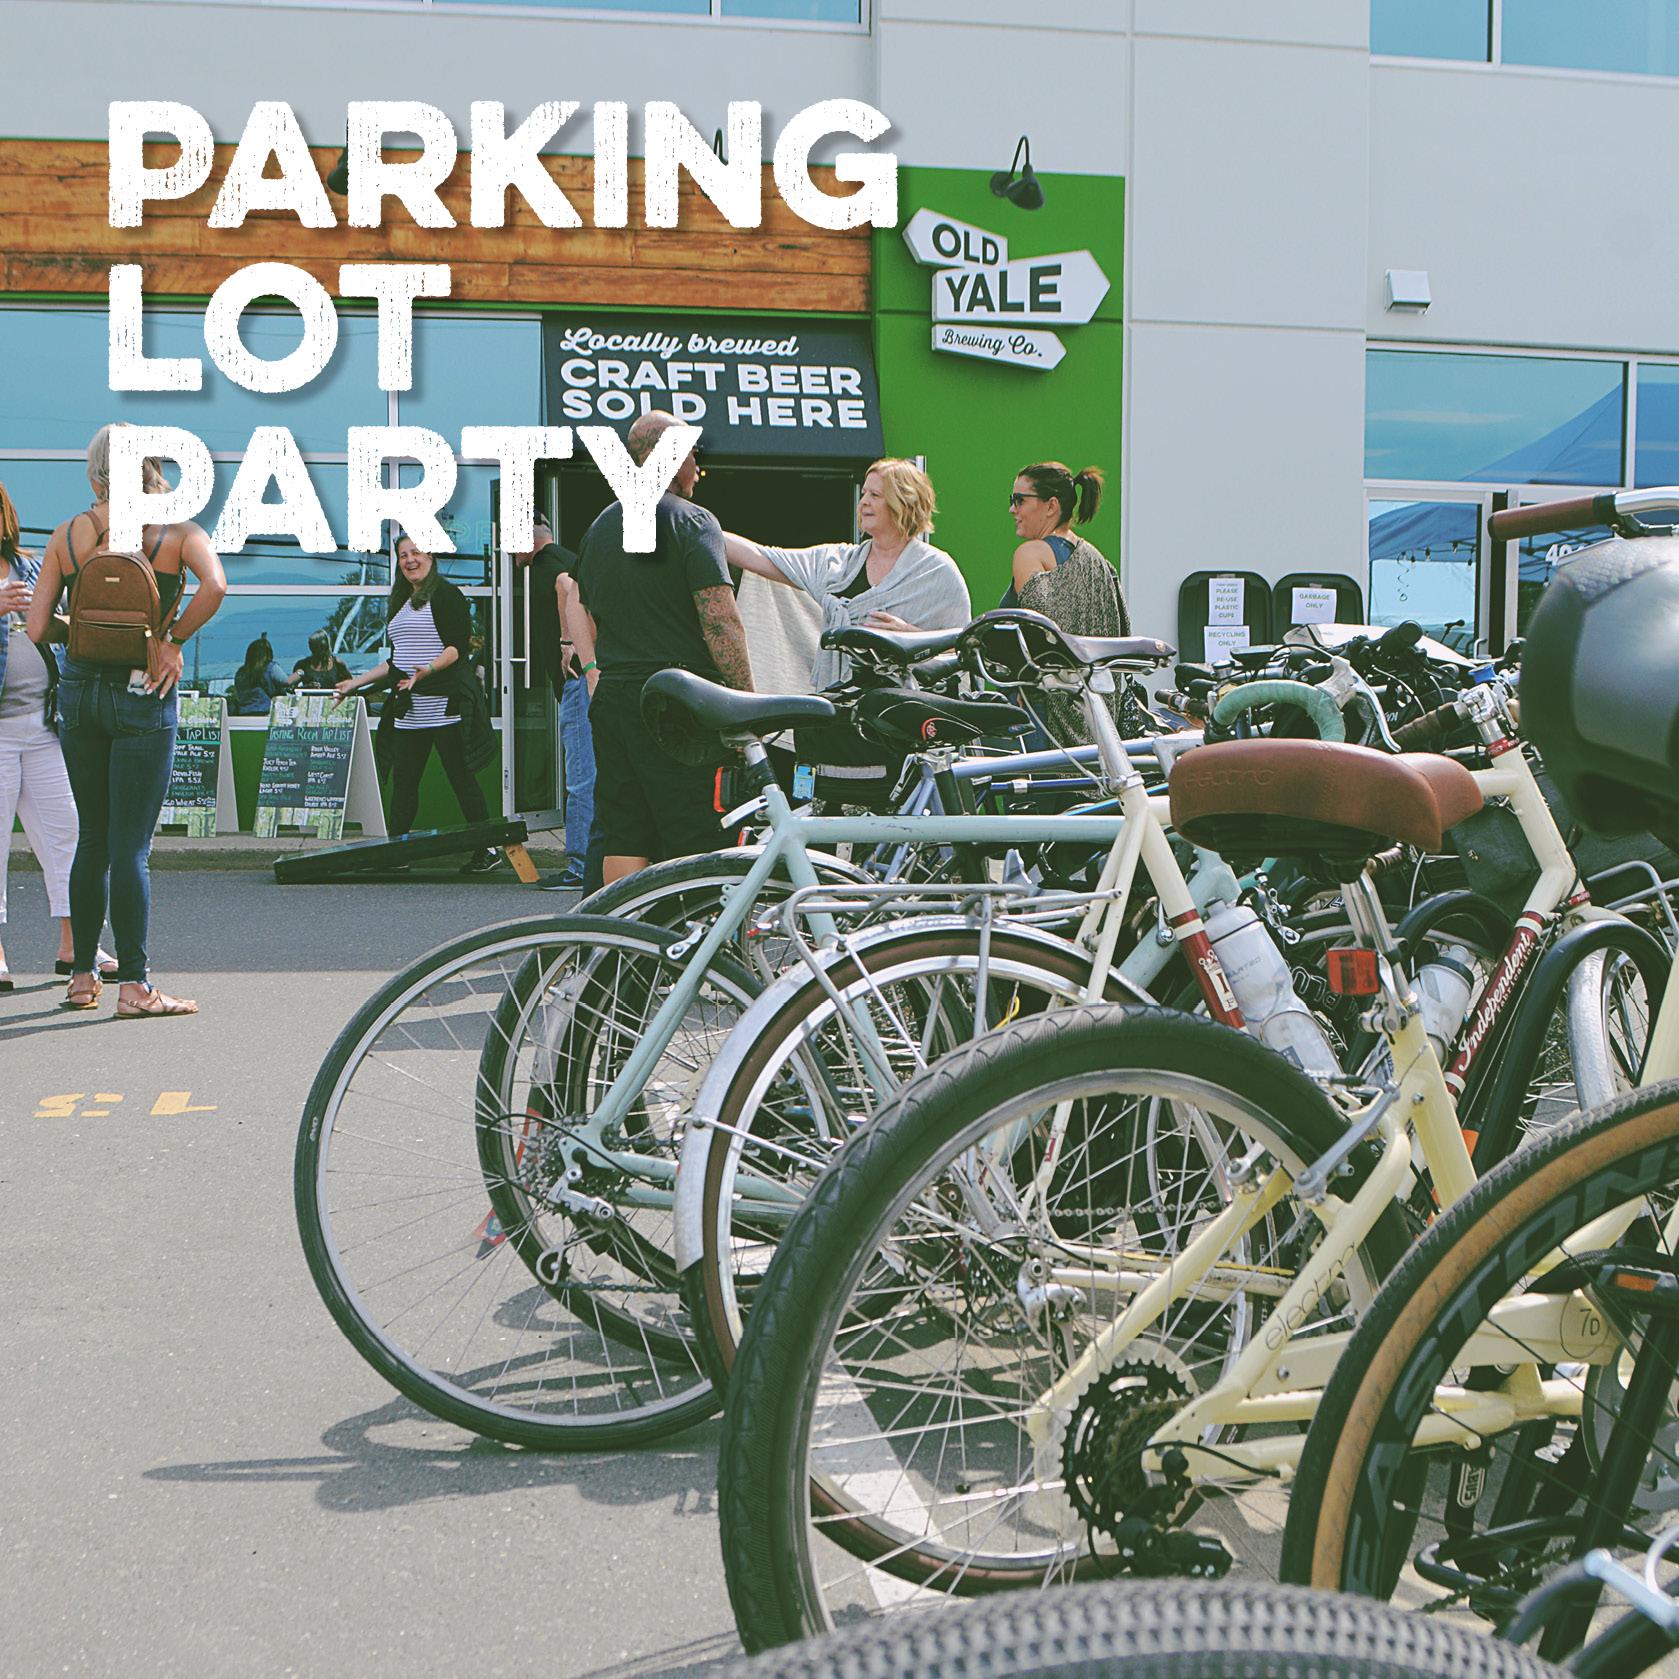 Parking Lot Party 2.0